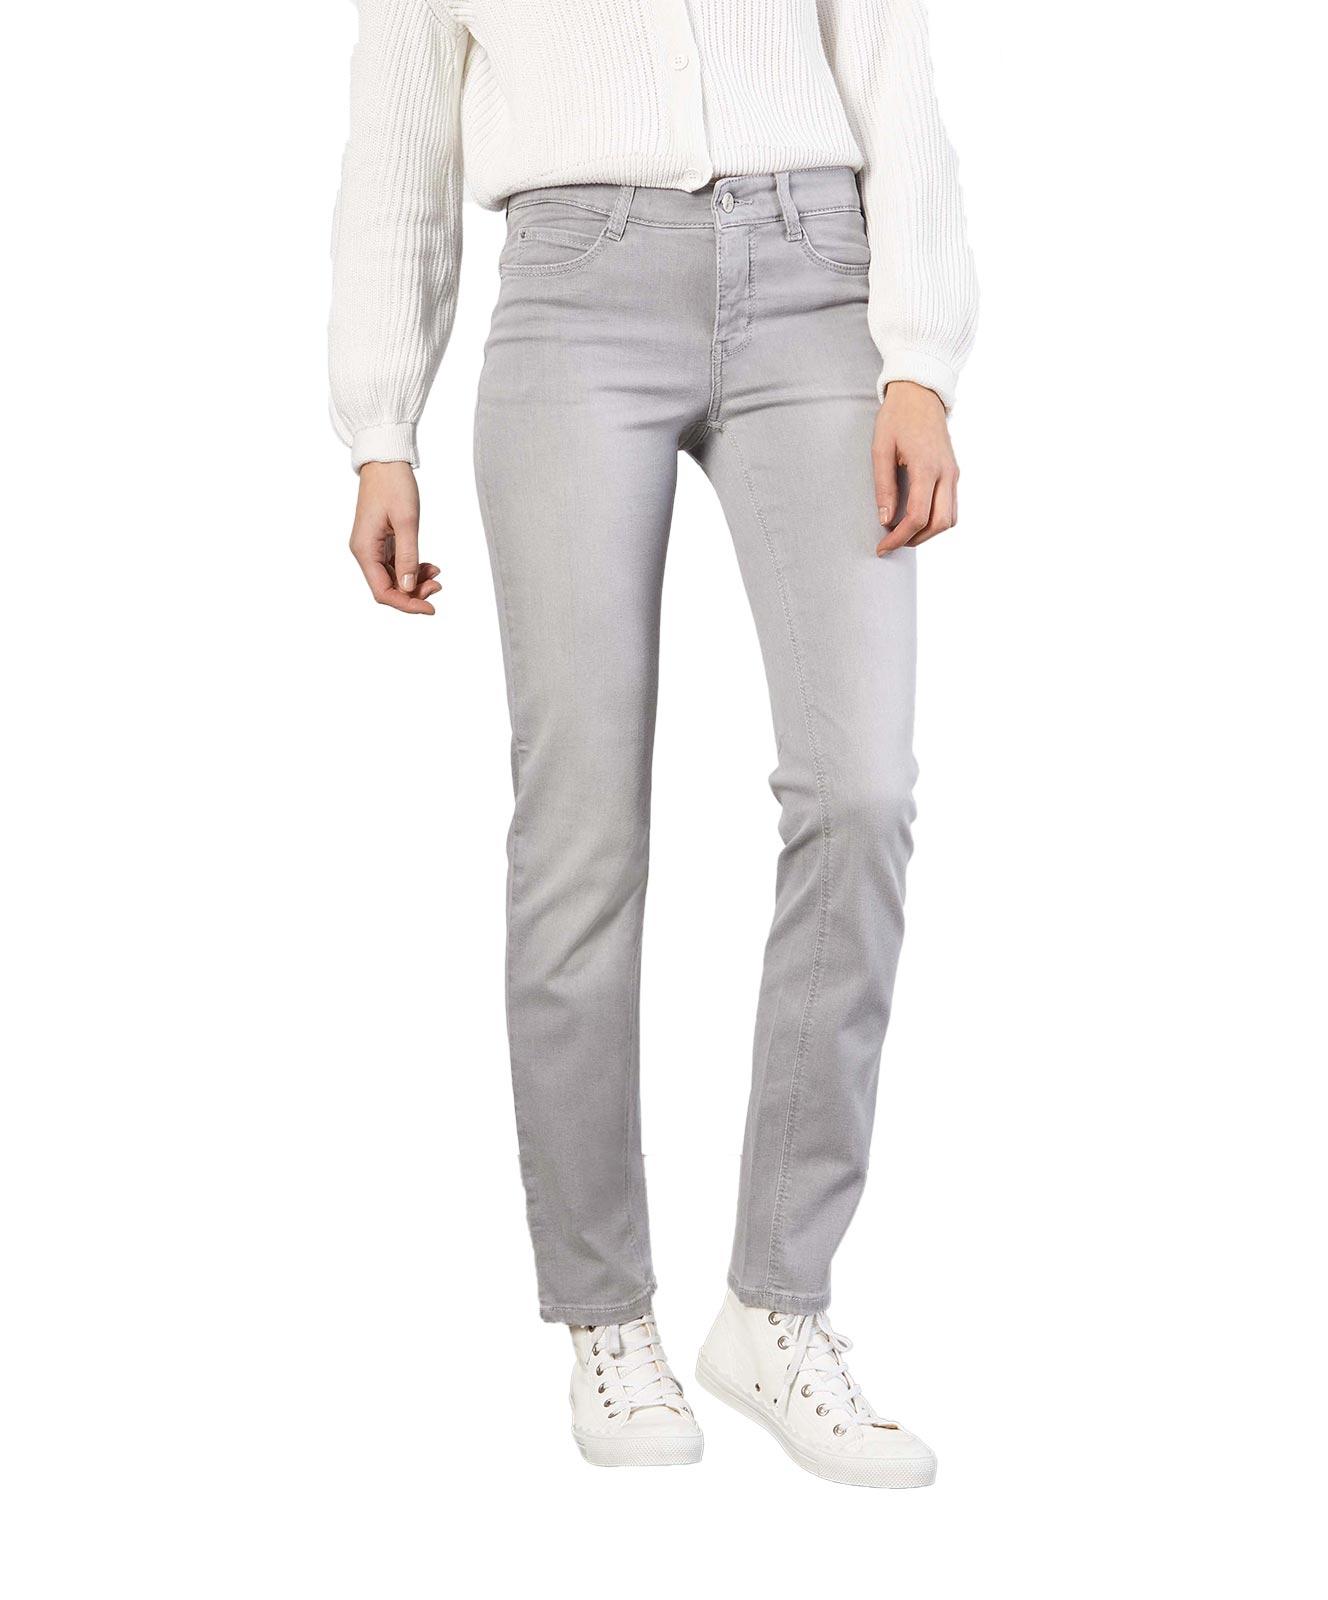 Hosen - MAC Straight Leg Jeans Dream in Silver Grey Used  - Onlineshop Jeans Meile